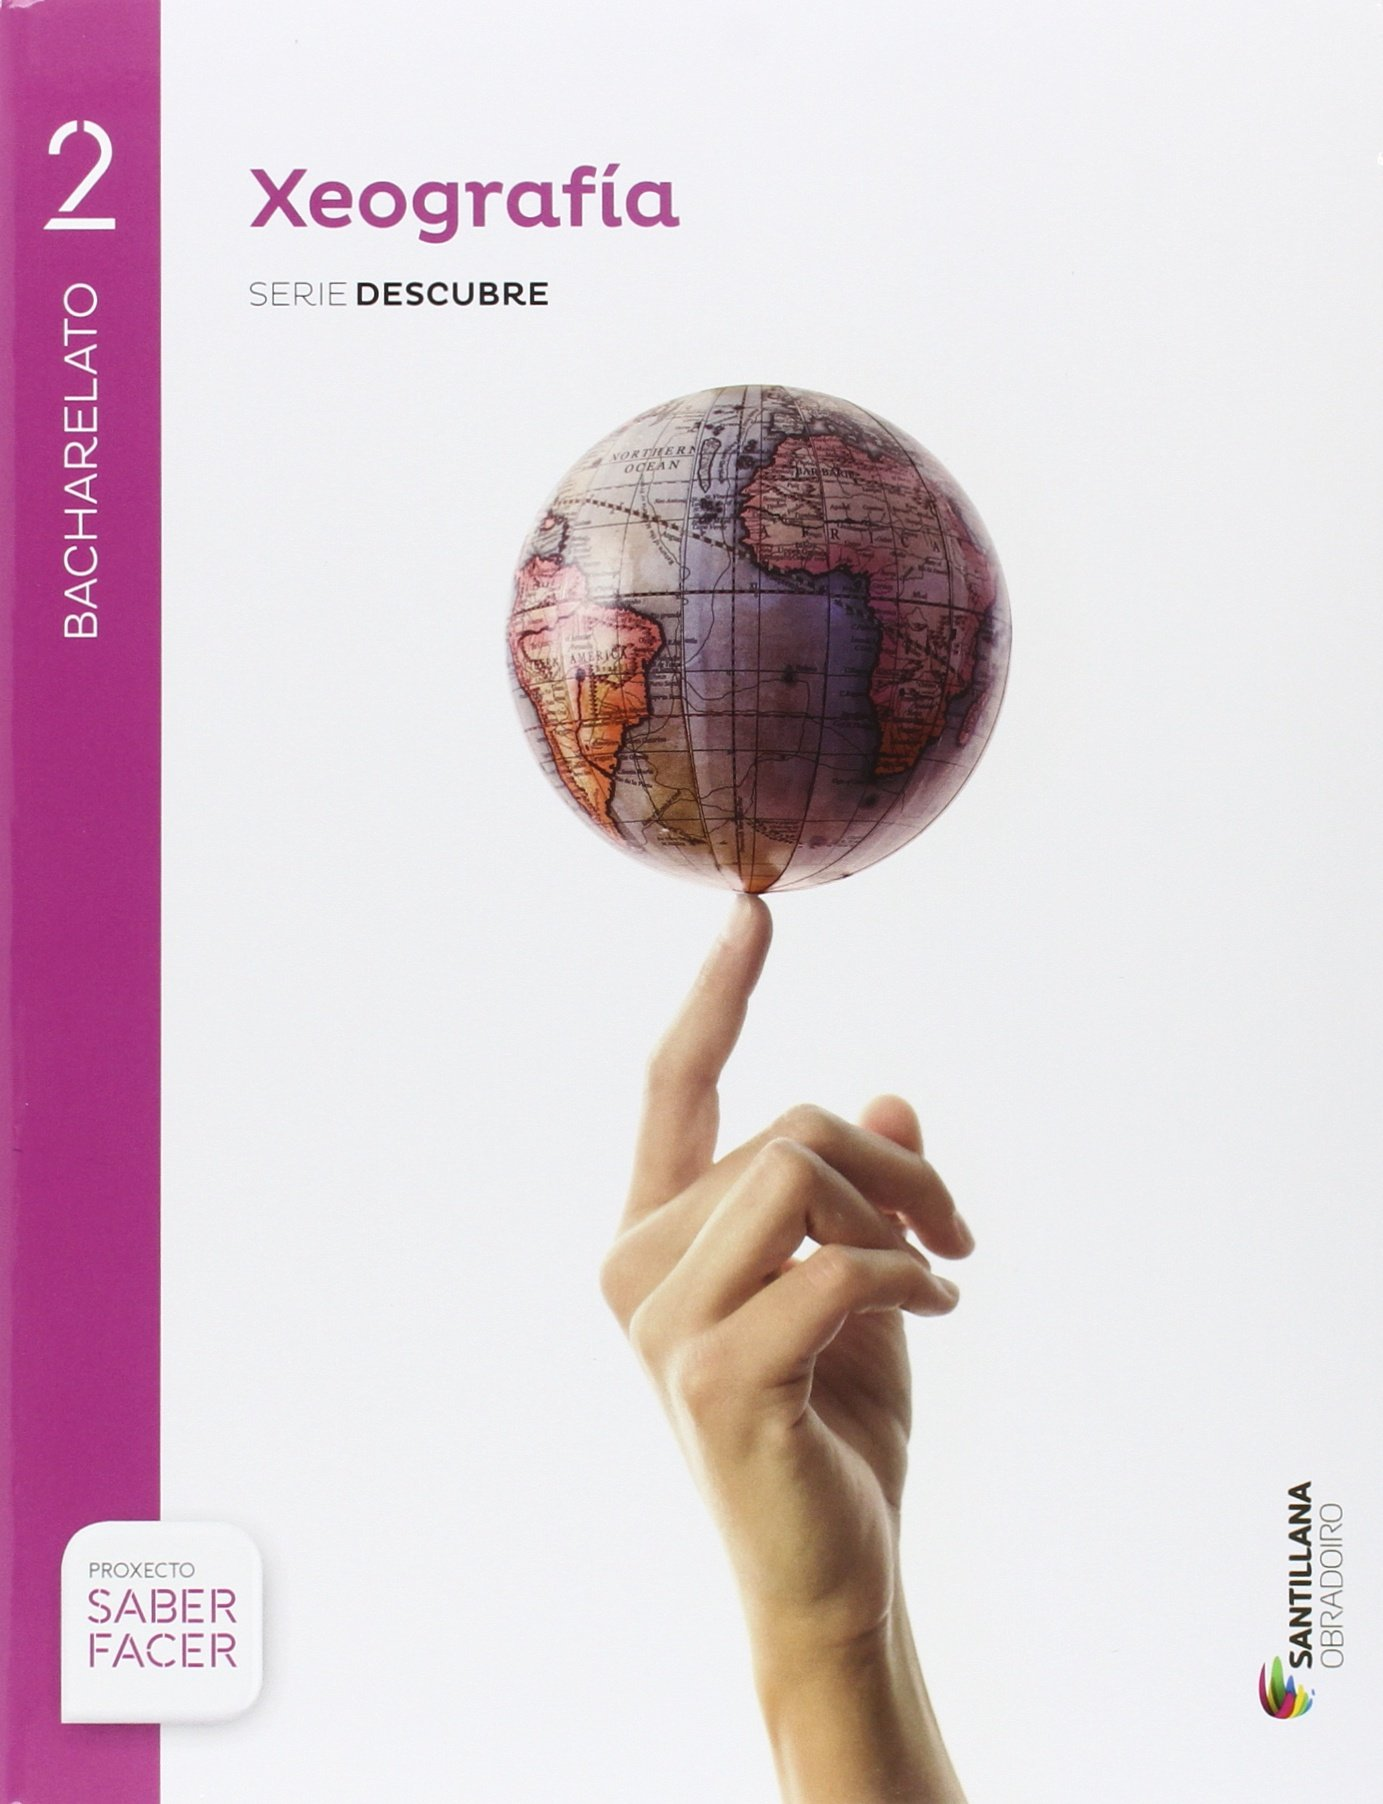 GEOGRAFÍA 2BCH + CUADERNO EVA SANTILLANA OBRADOIRO - 9788499727028: Amazon.es: Aa.Vv.: Libros